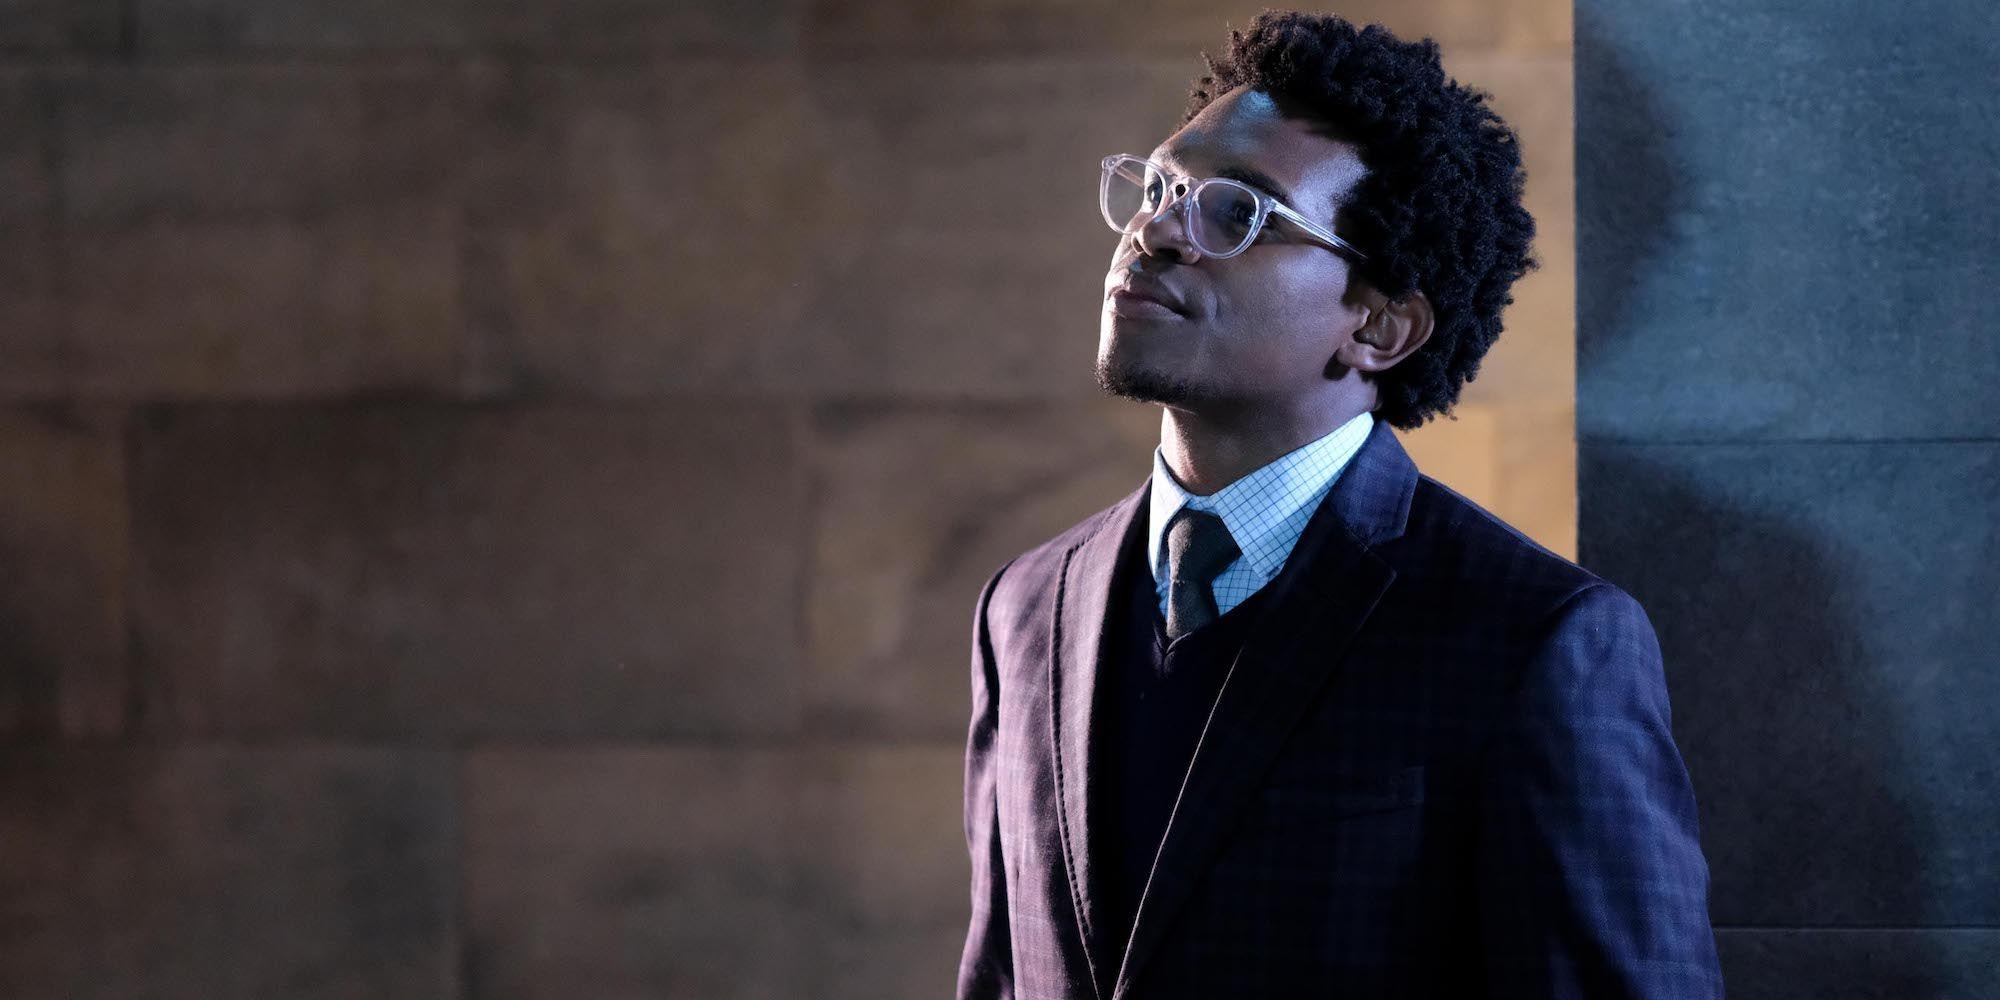 Batwoman Co-Star Camrus Johnson Discusses Playing Luke Fox | CBR